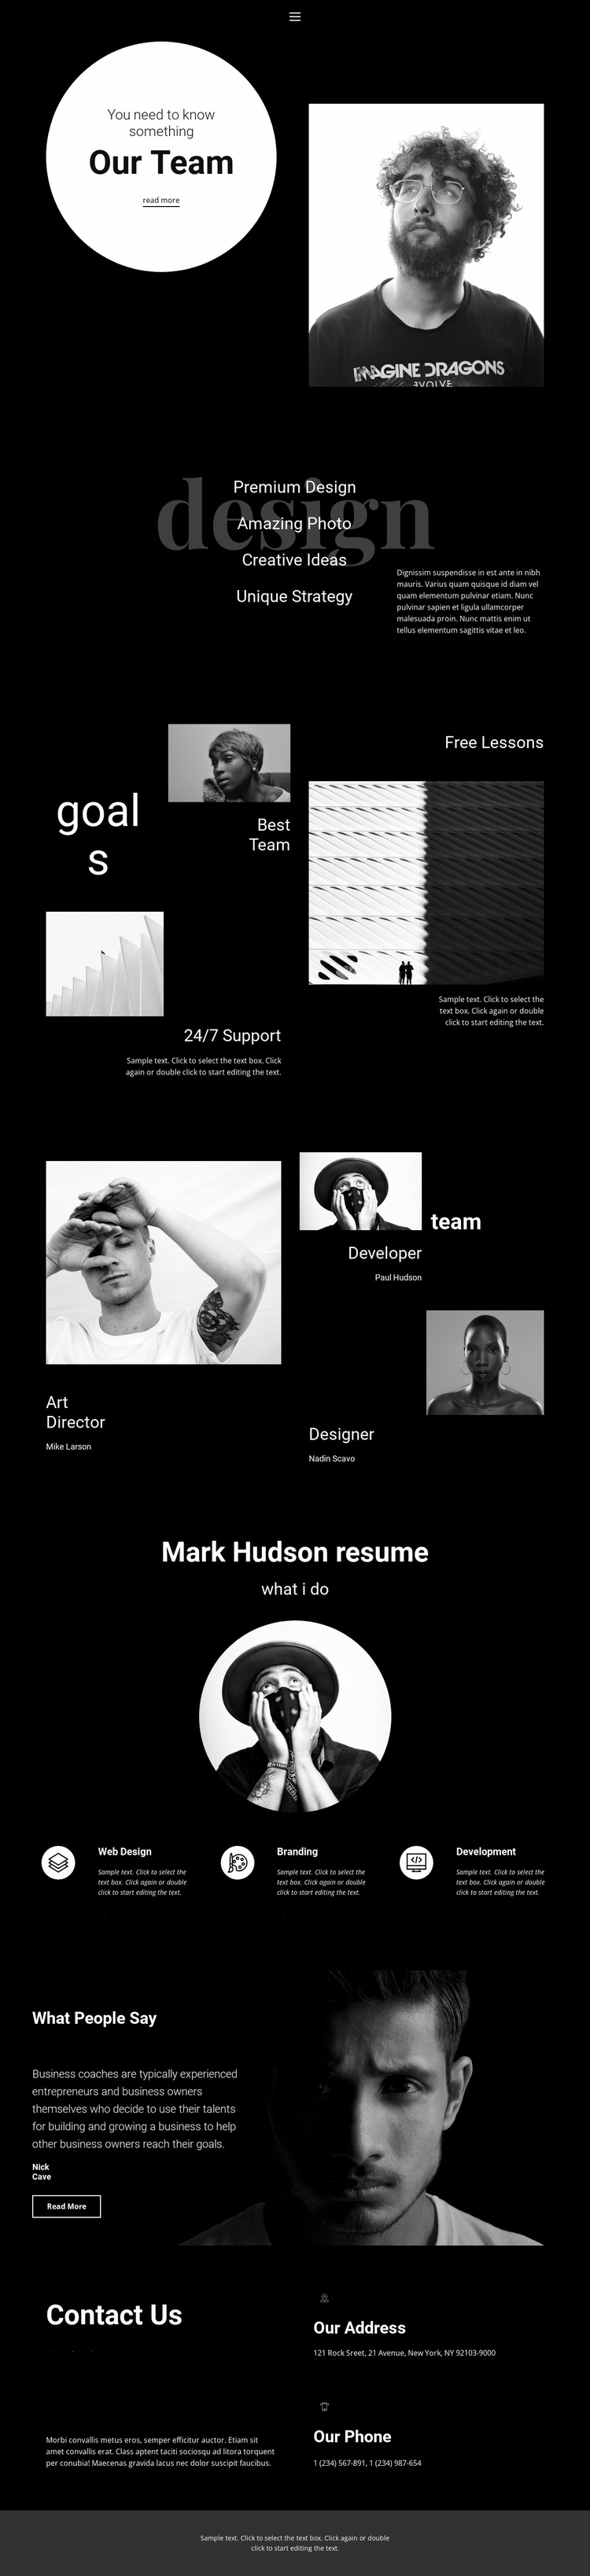 Design and development team Website Template